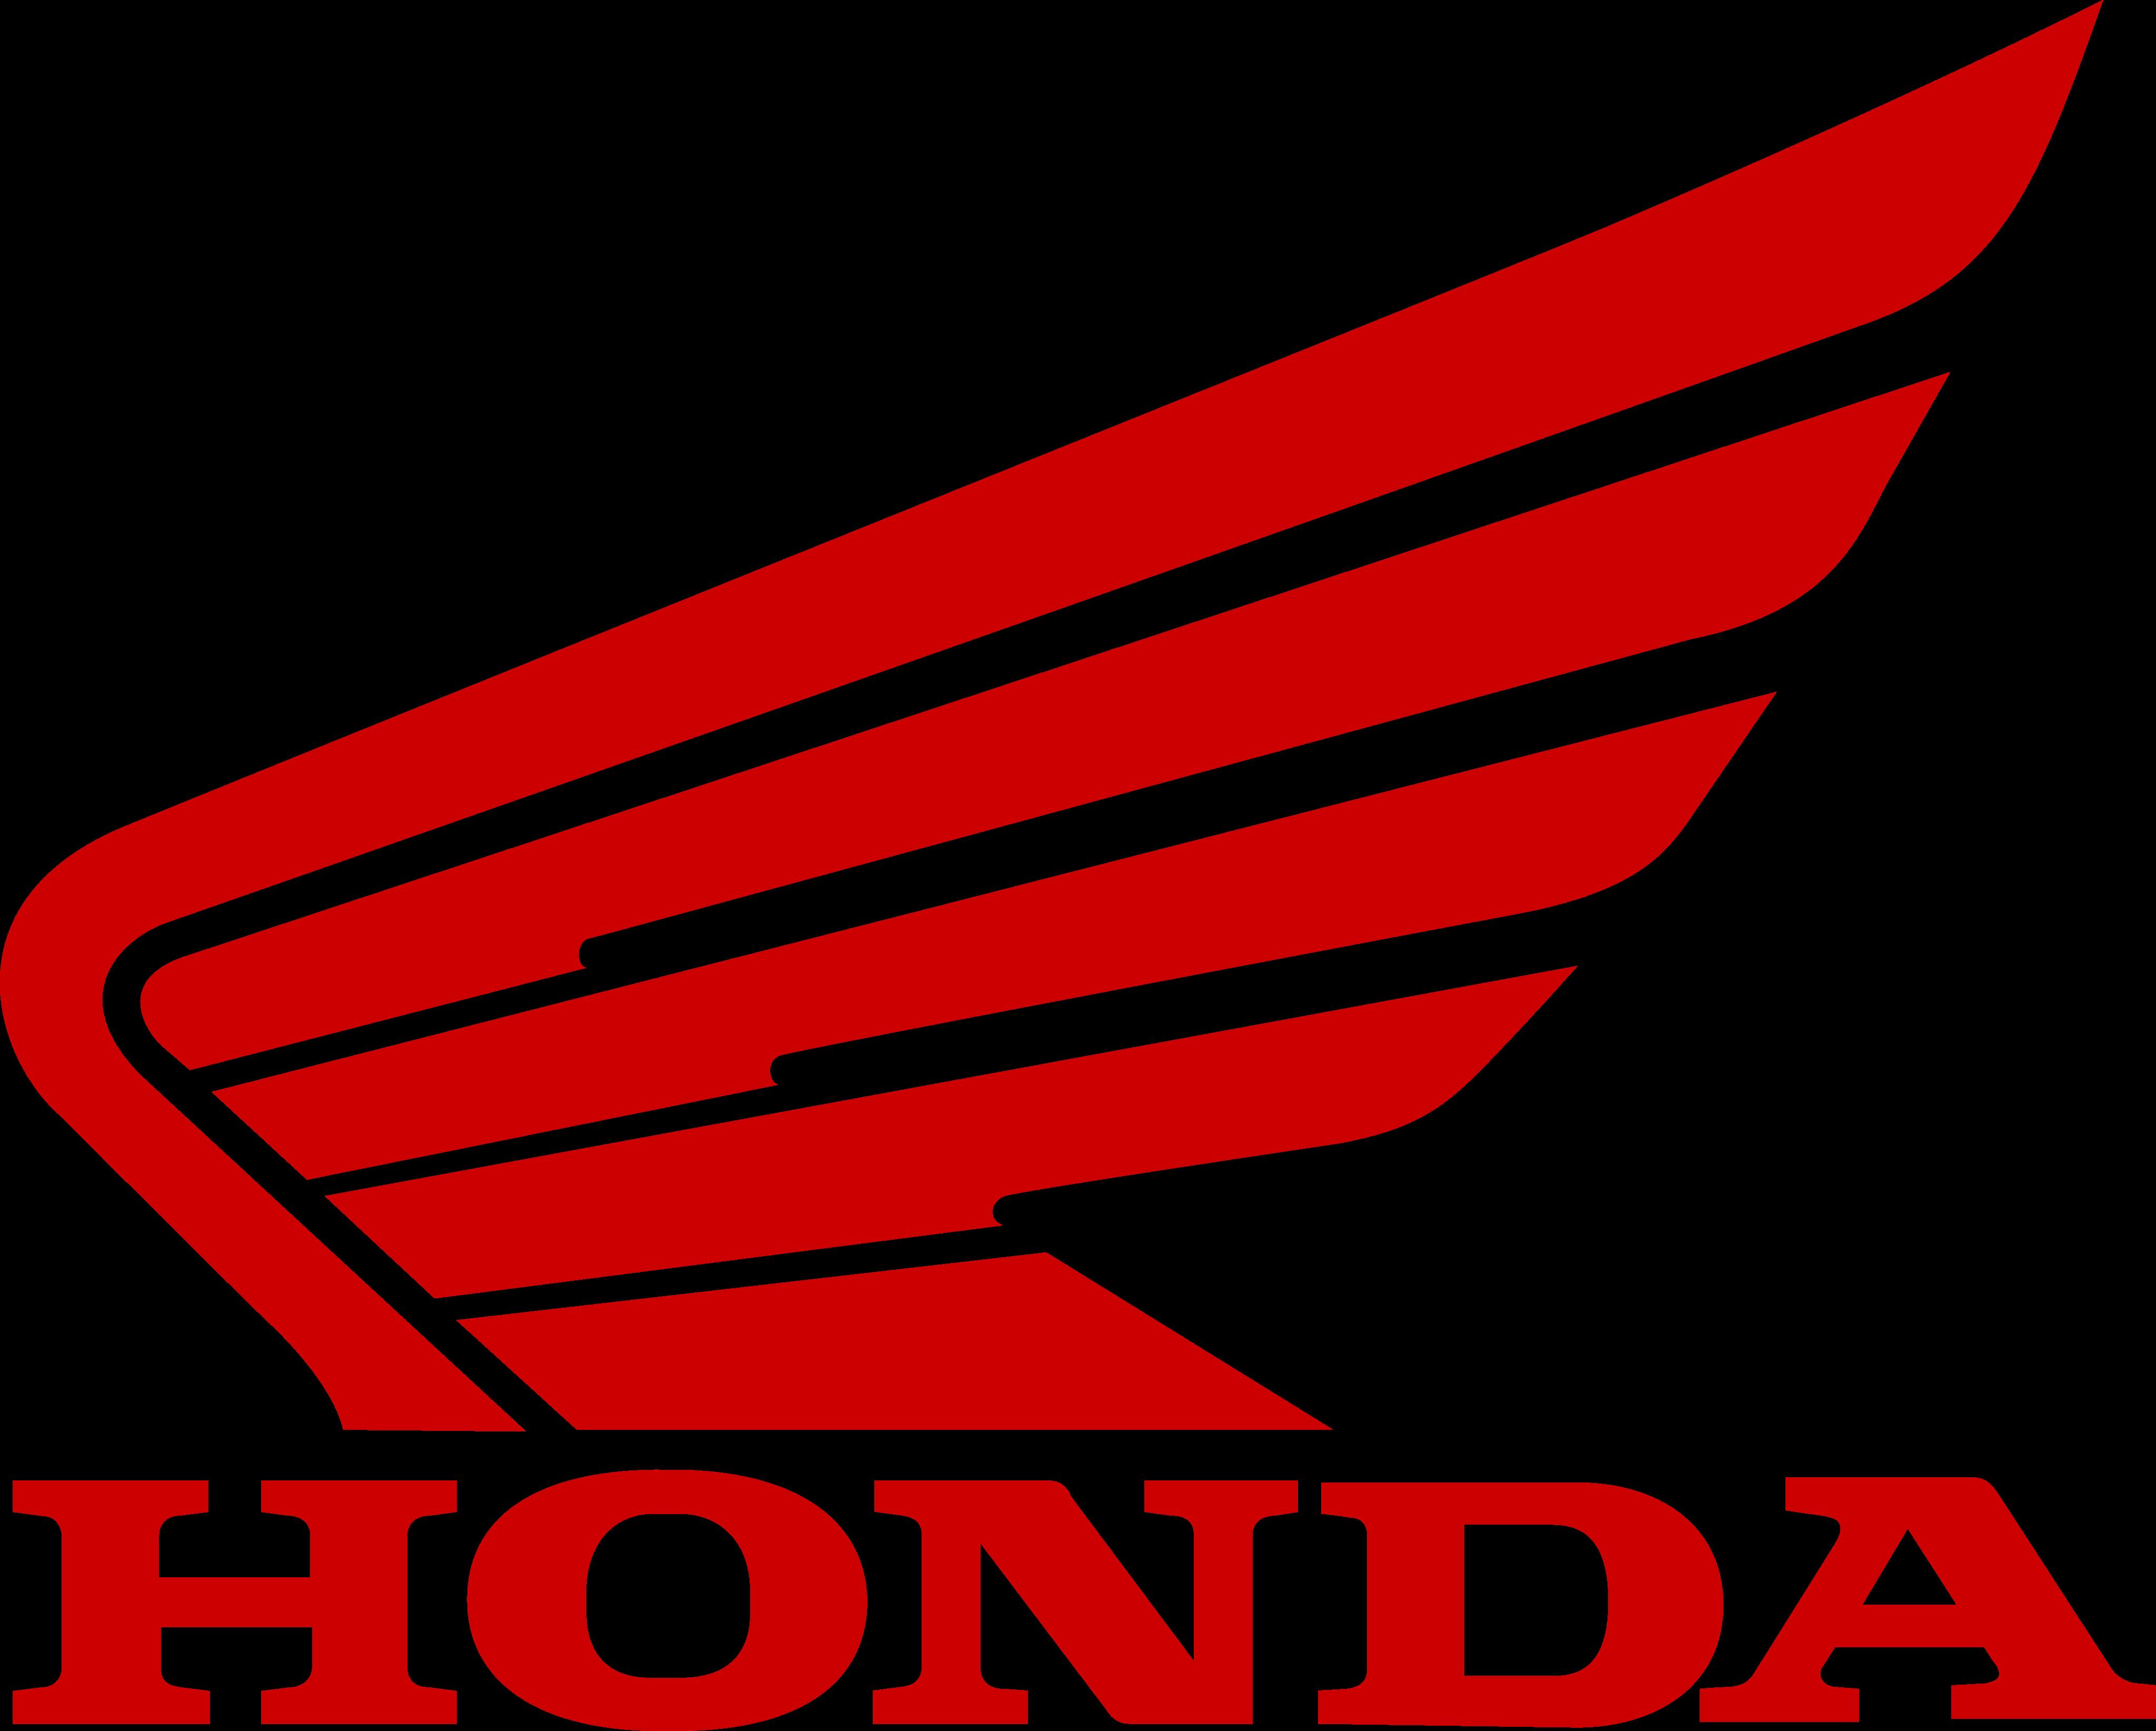 honda motos logo 1 1 - Honda Motorcycles Logo